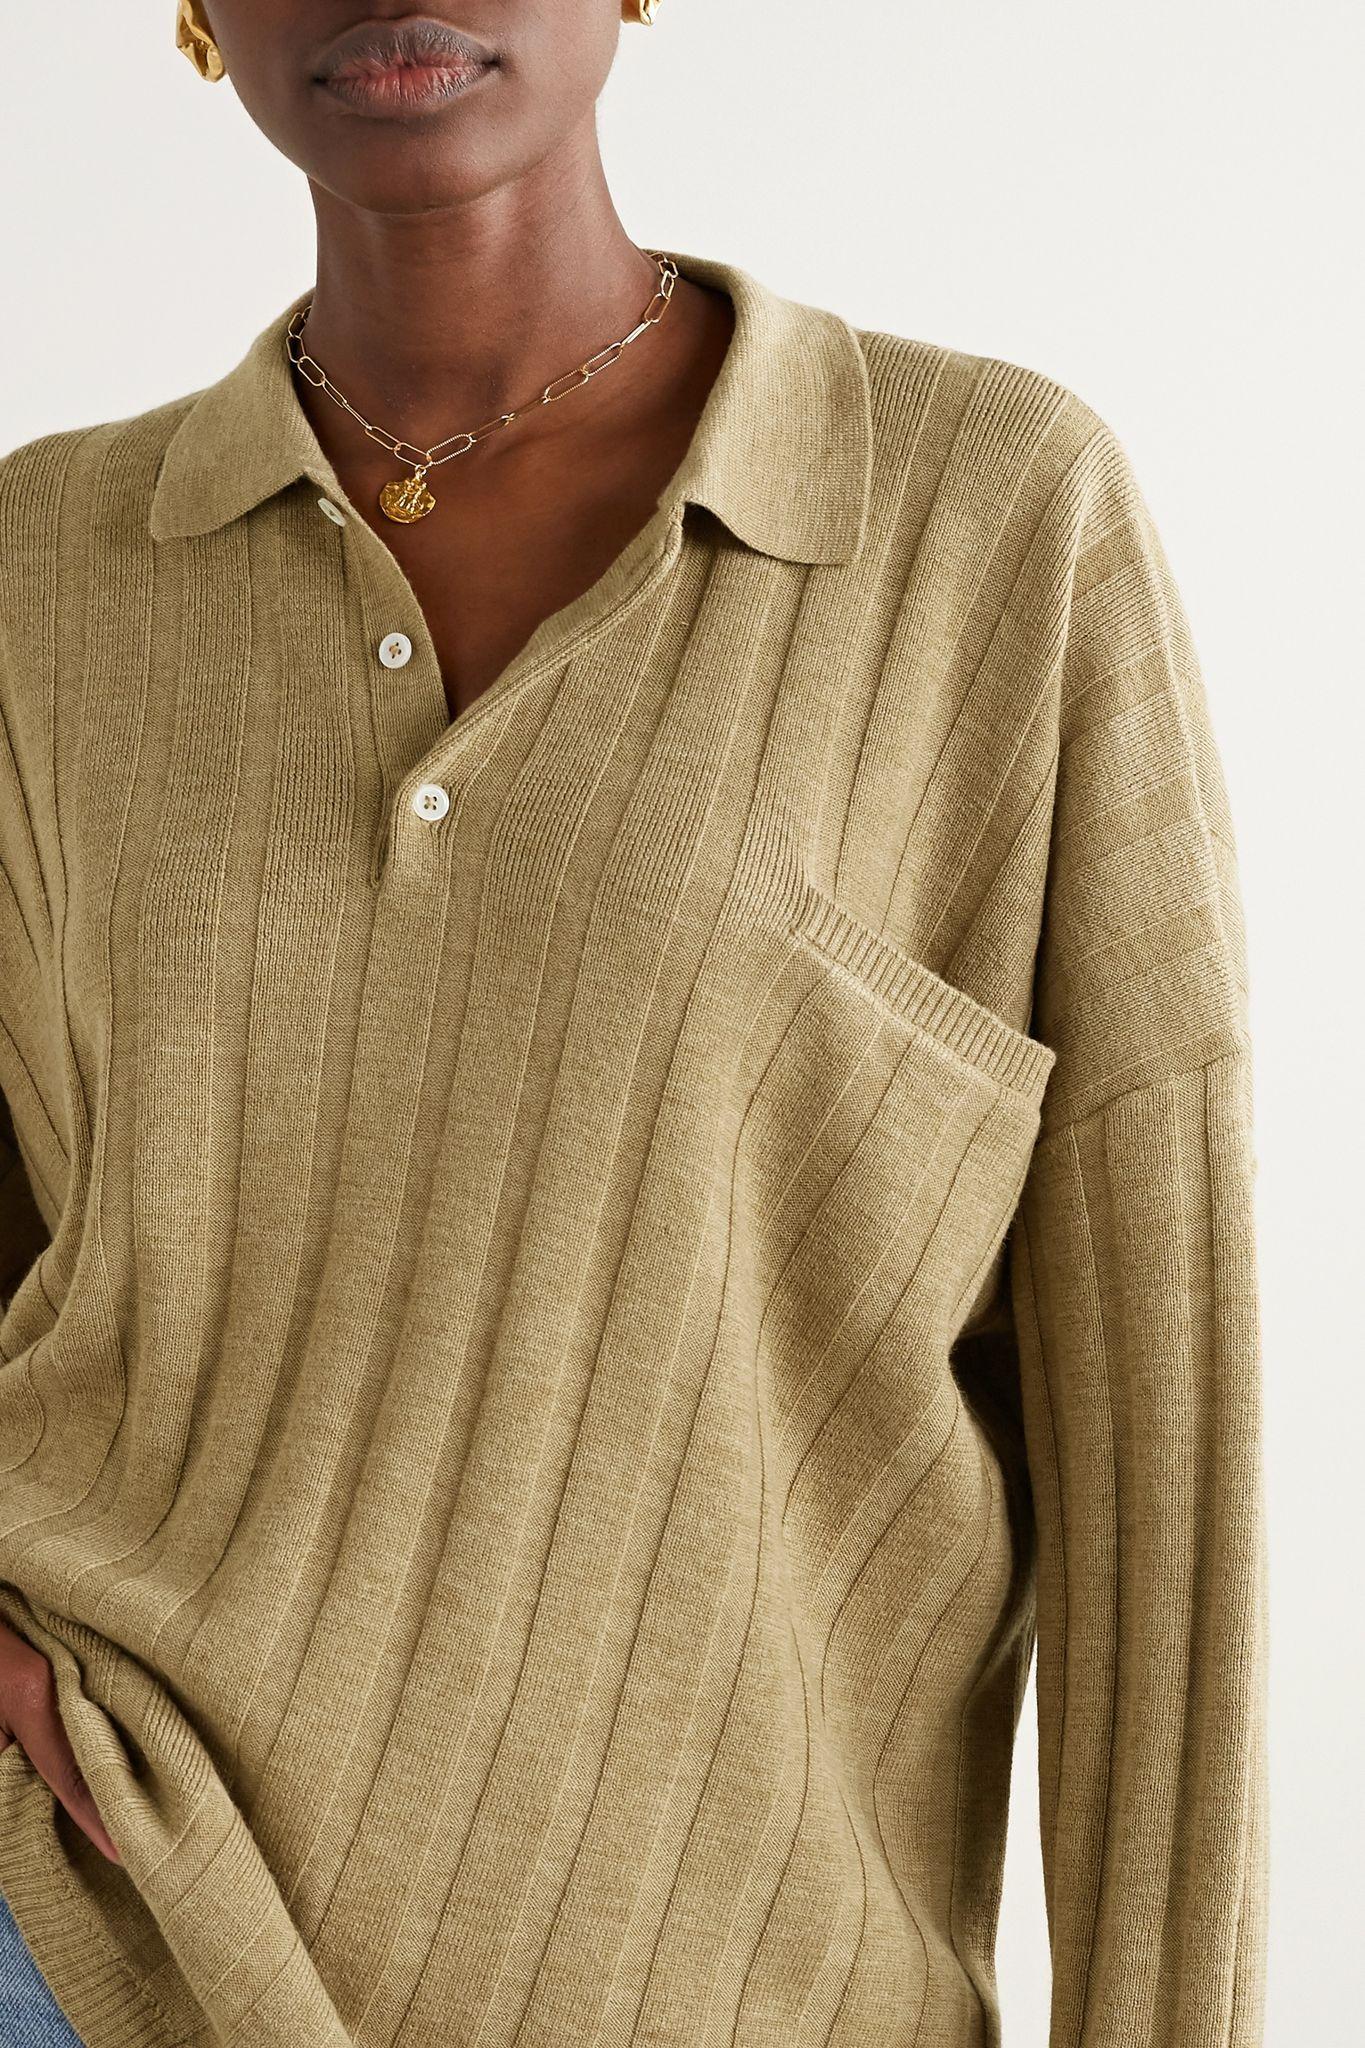 Tan Bonifacio Oversized Ribbed Merino Wool Sweater Toteme In 2020 Merino Wool Sweater Sweaters Wool Sweaters